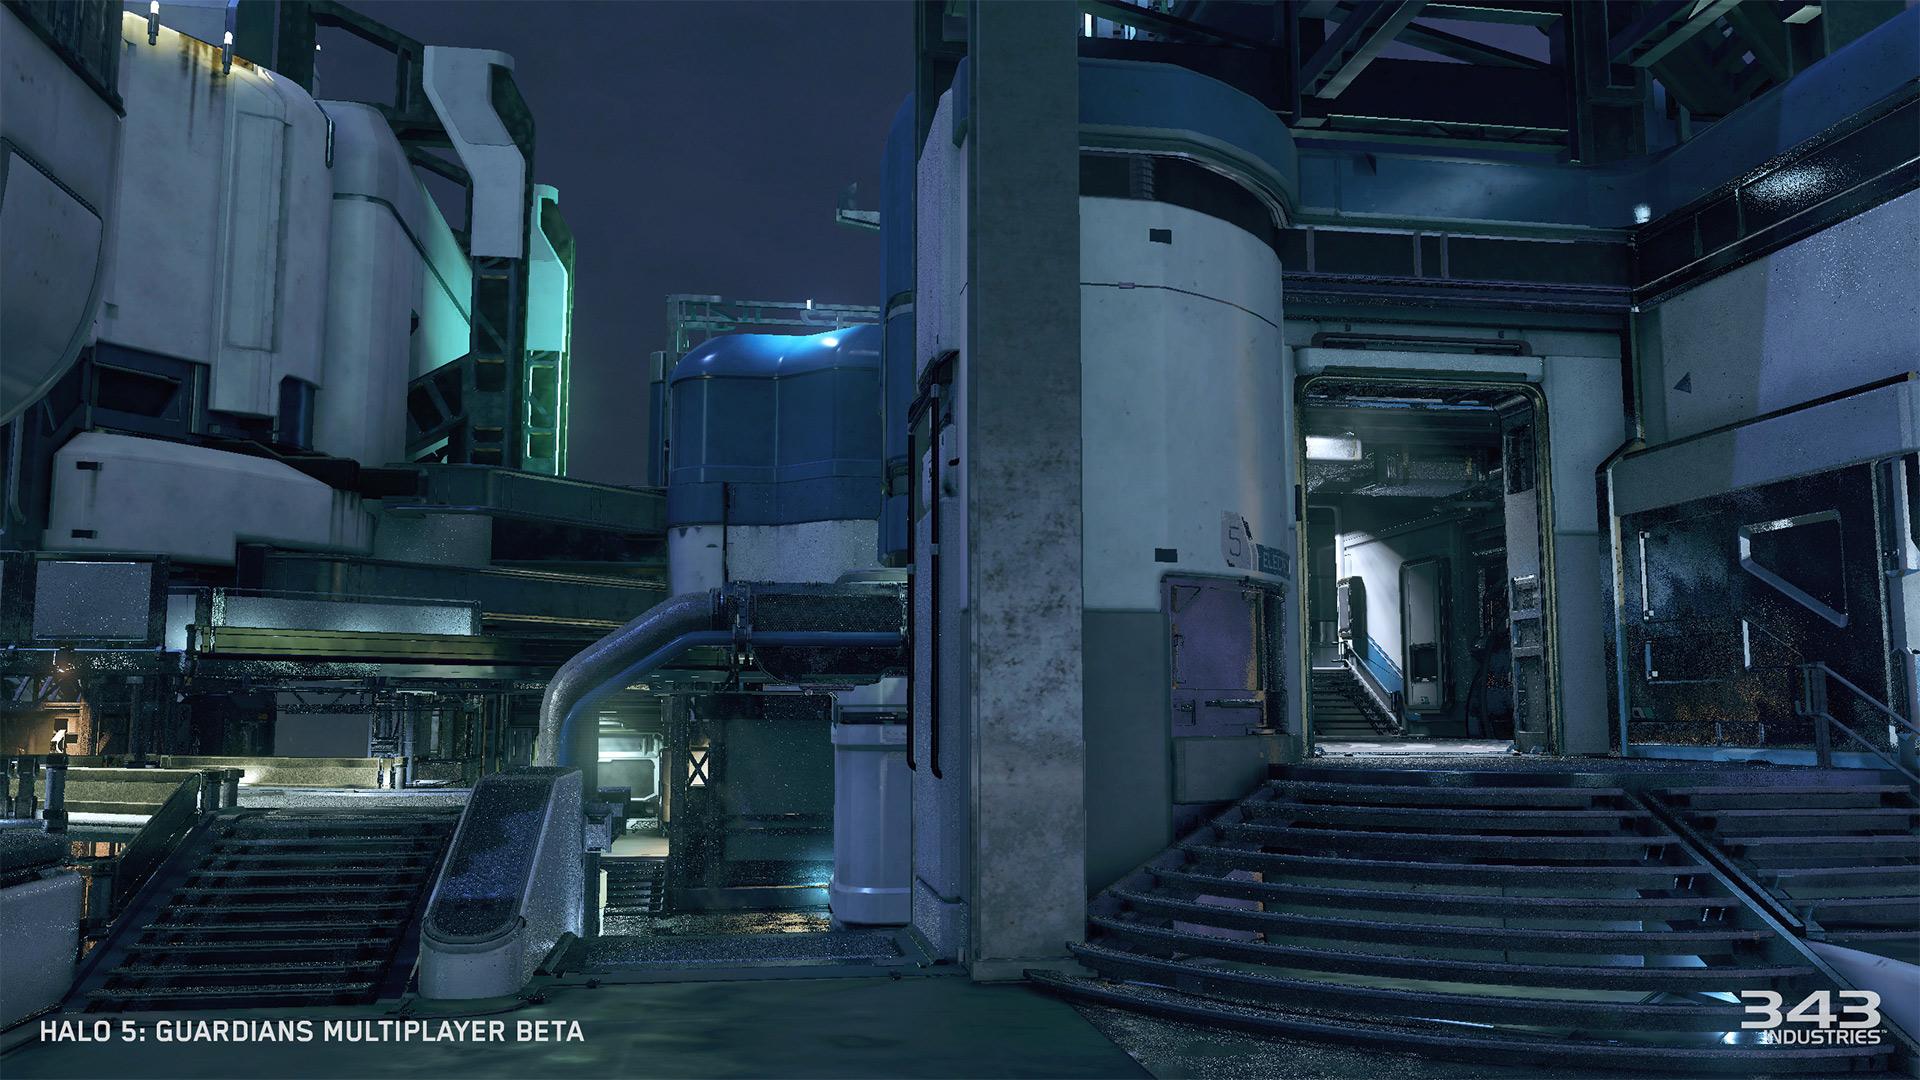 Halo 5 Guardians Multiplayer Beta Impressions: Week 1